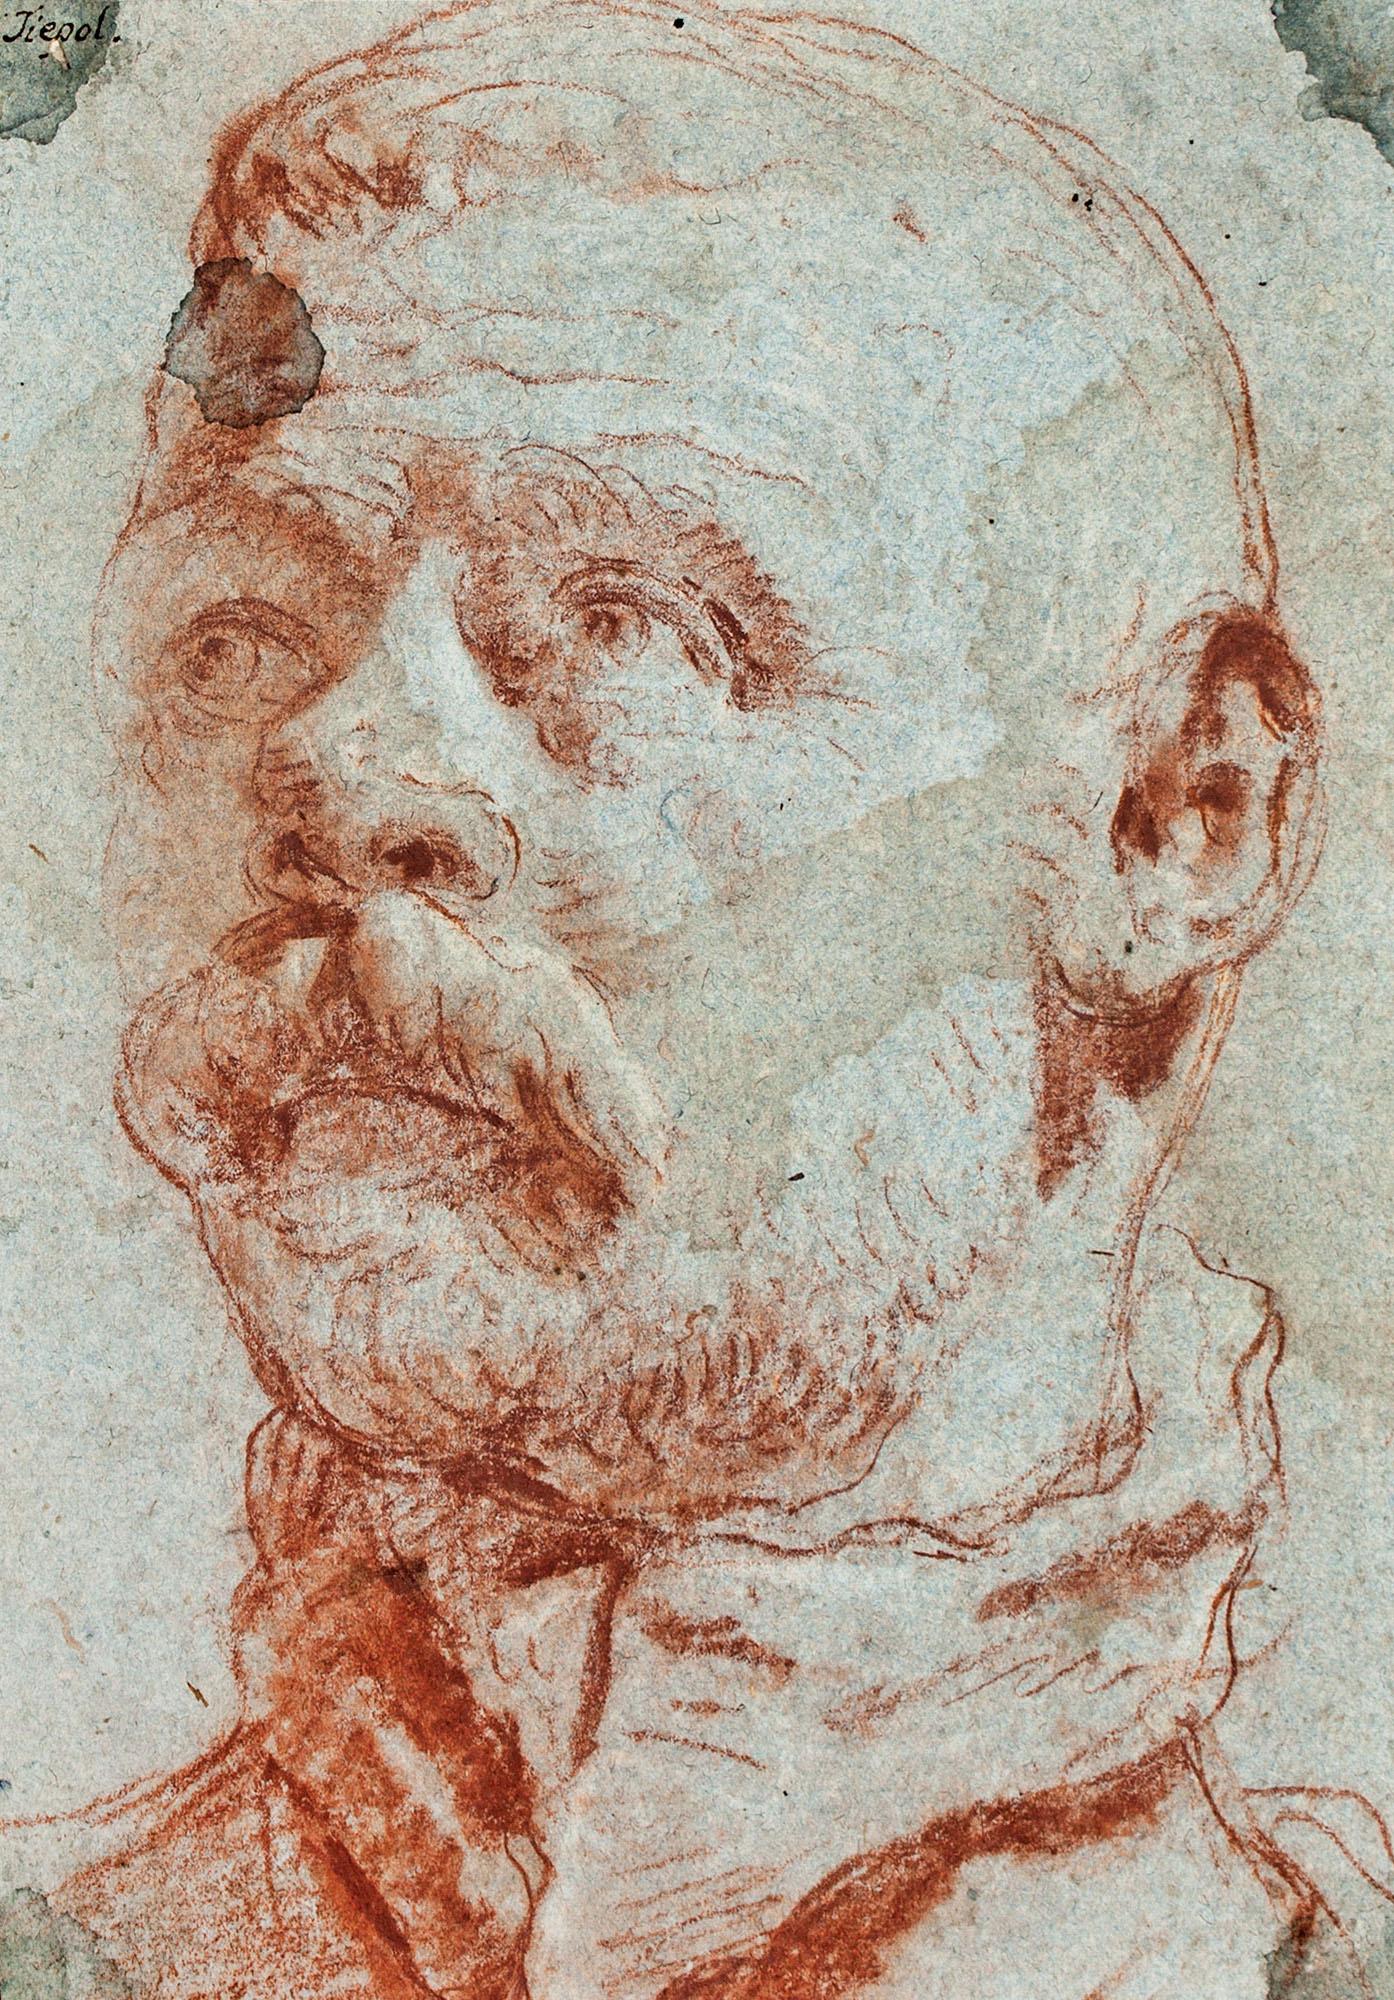 Giovanni Battista Tiépolo. Estudio del busto del pintor Jacopo Palme, Il giovane. Salida: 40.000 euros. Remate: 100.000 euros